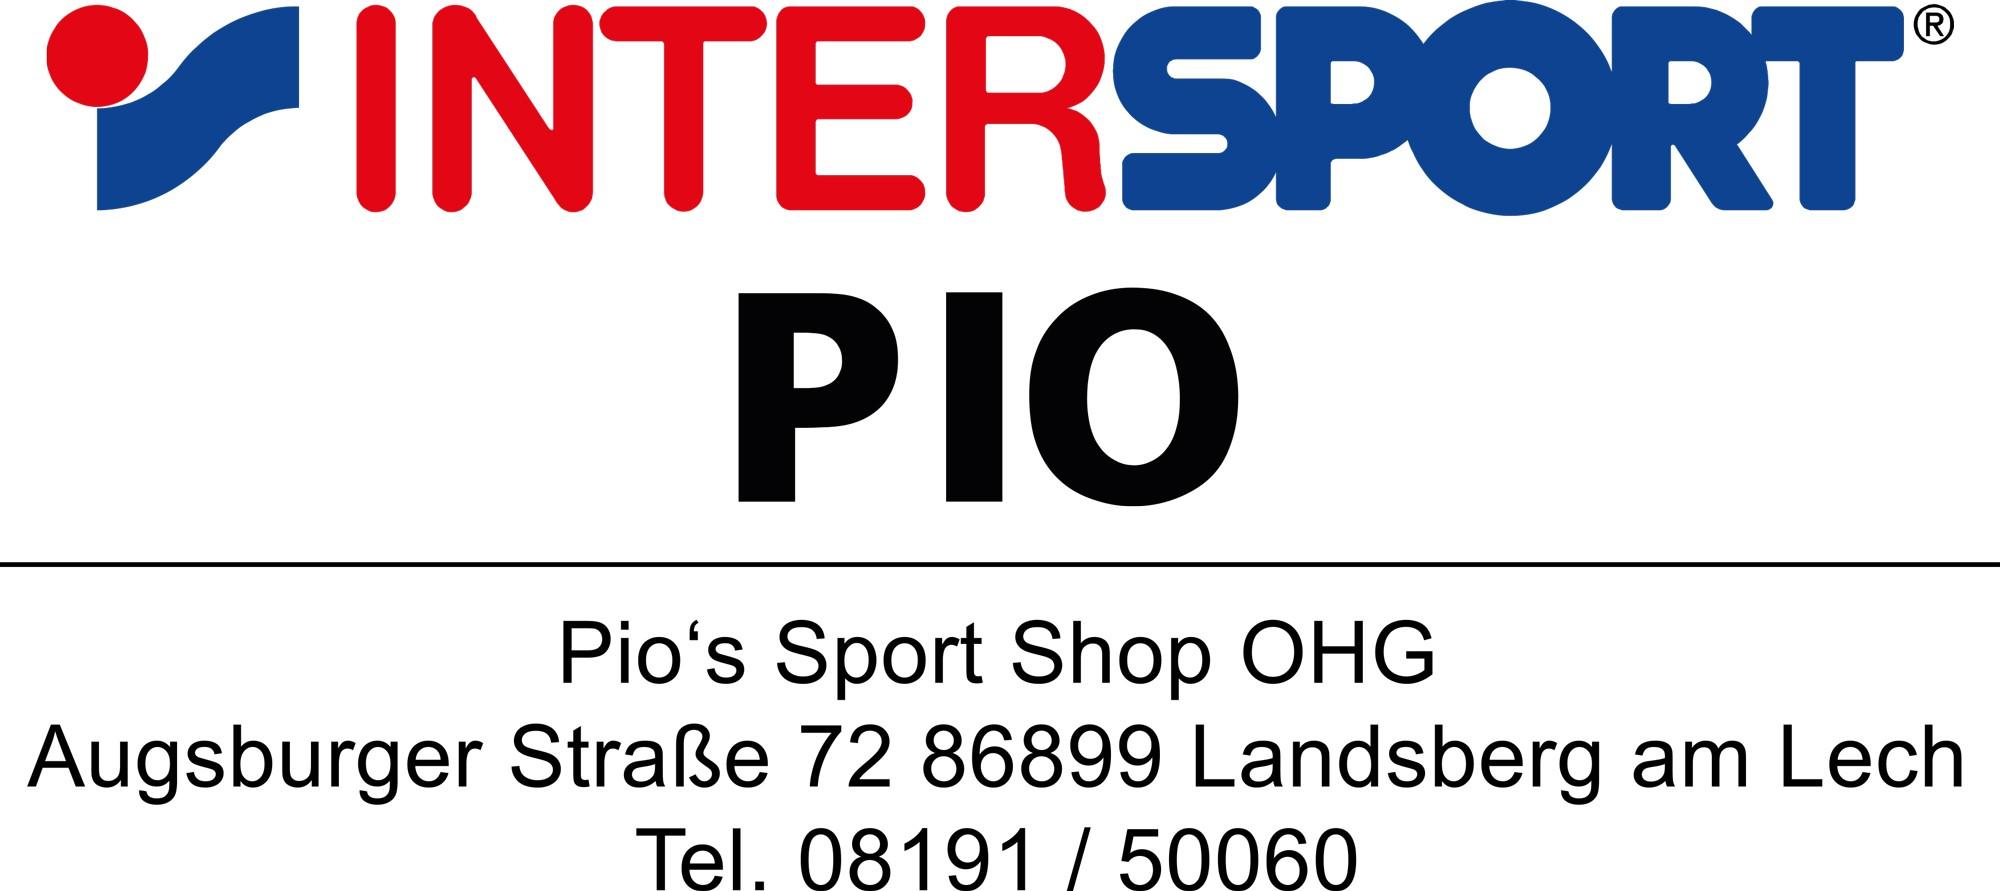 Pio's Sport Shop OHG